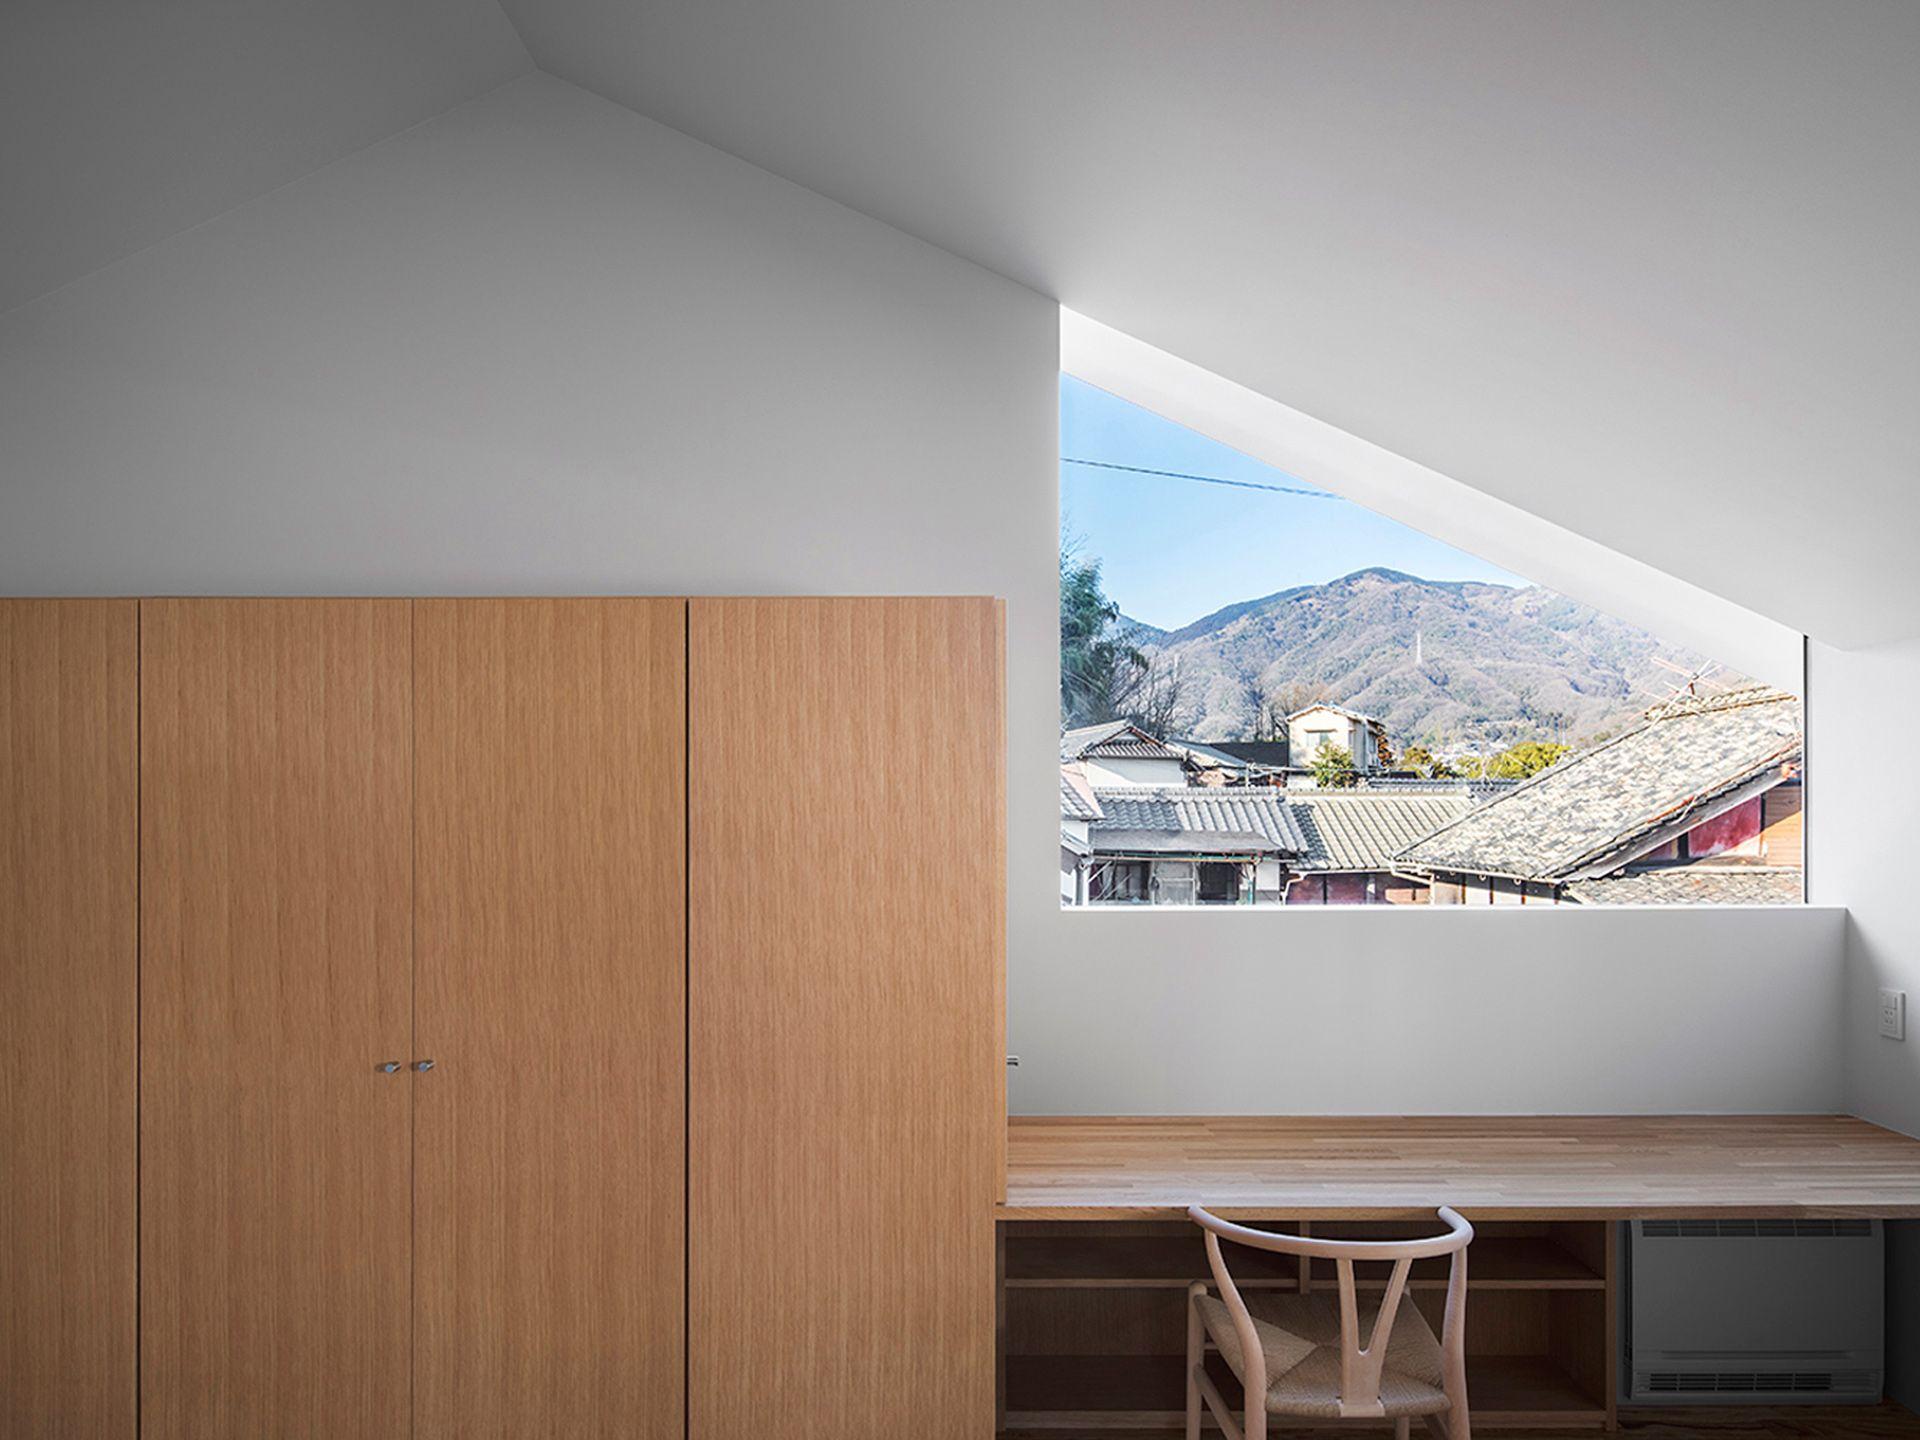 Daisaku Hanamoto s house mingles with its surroundings